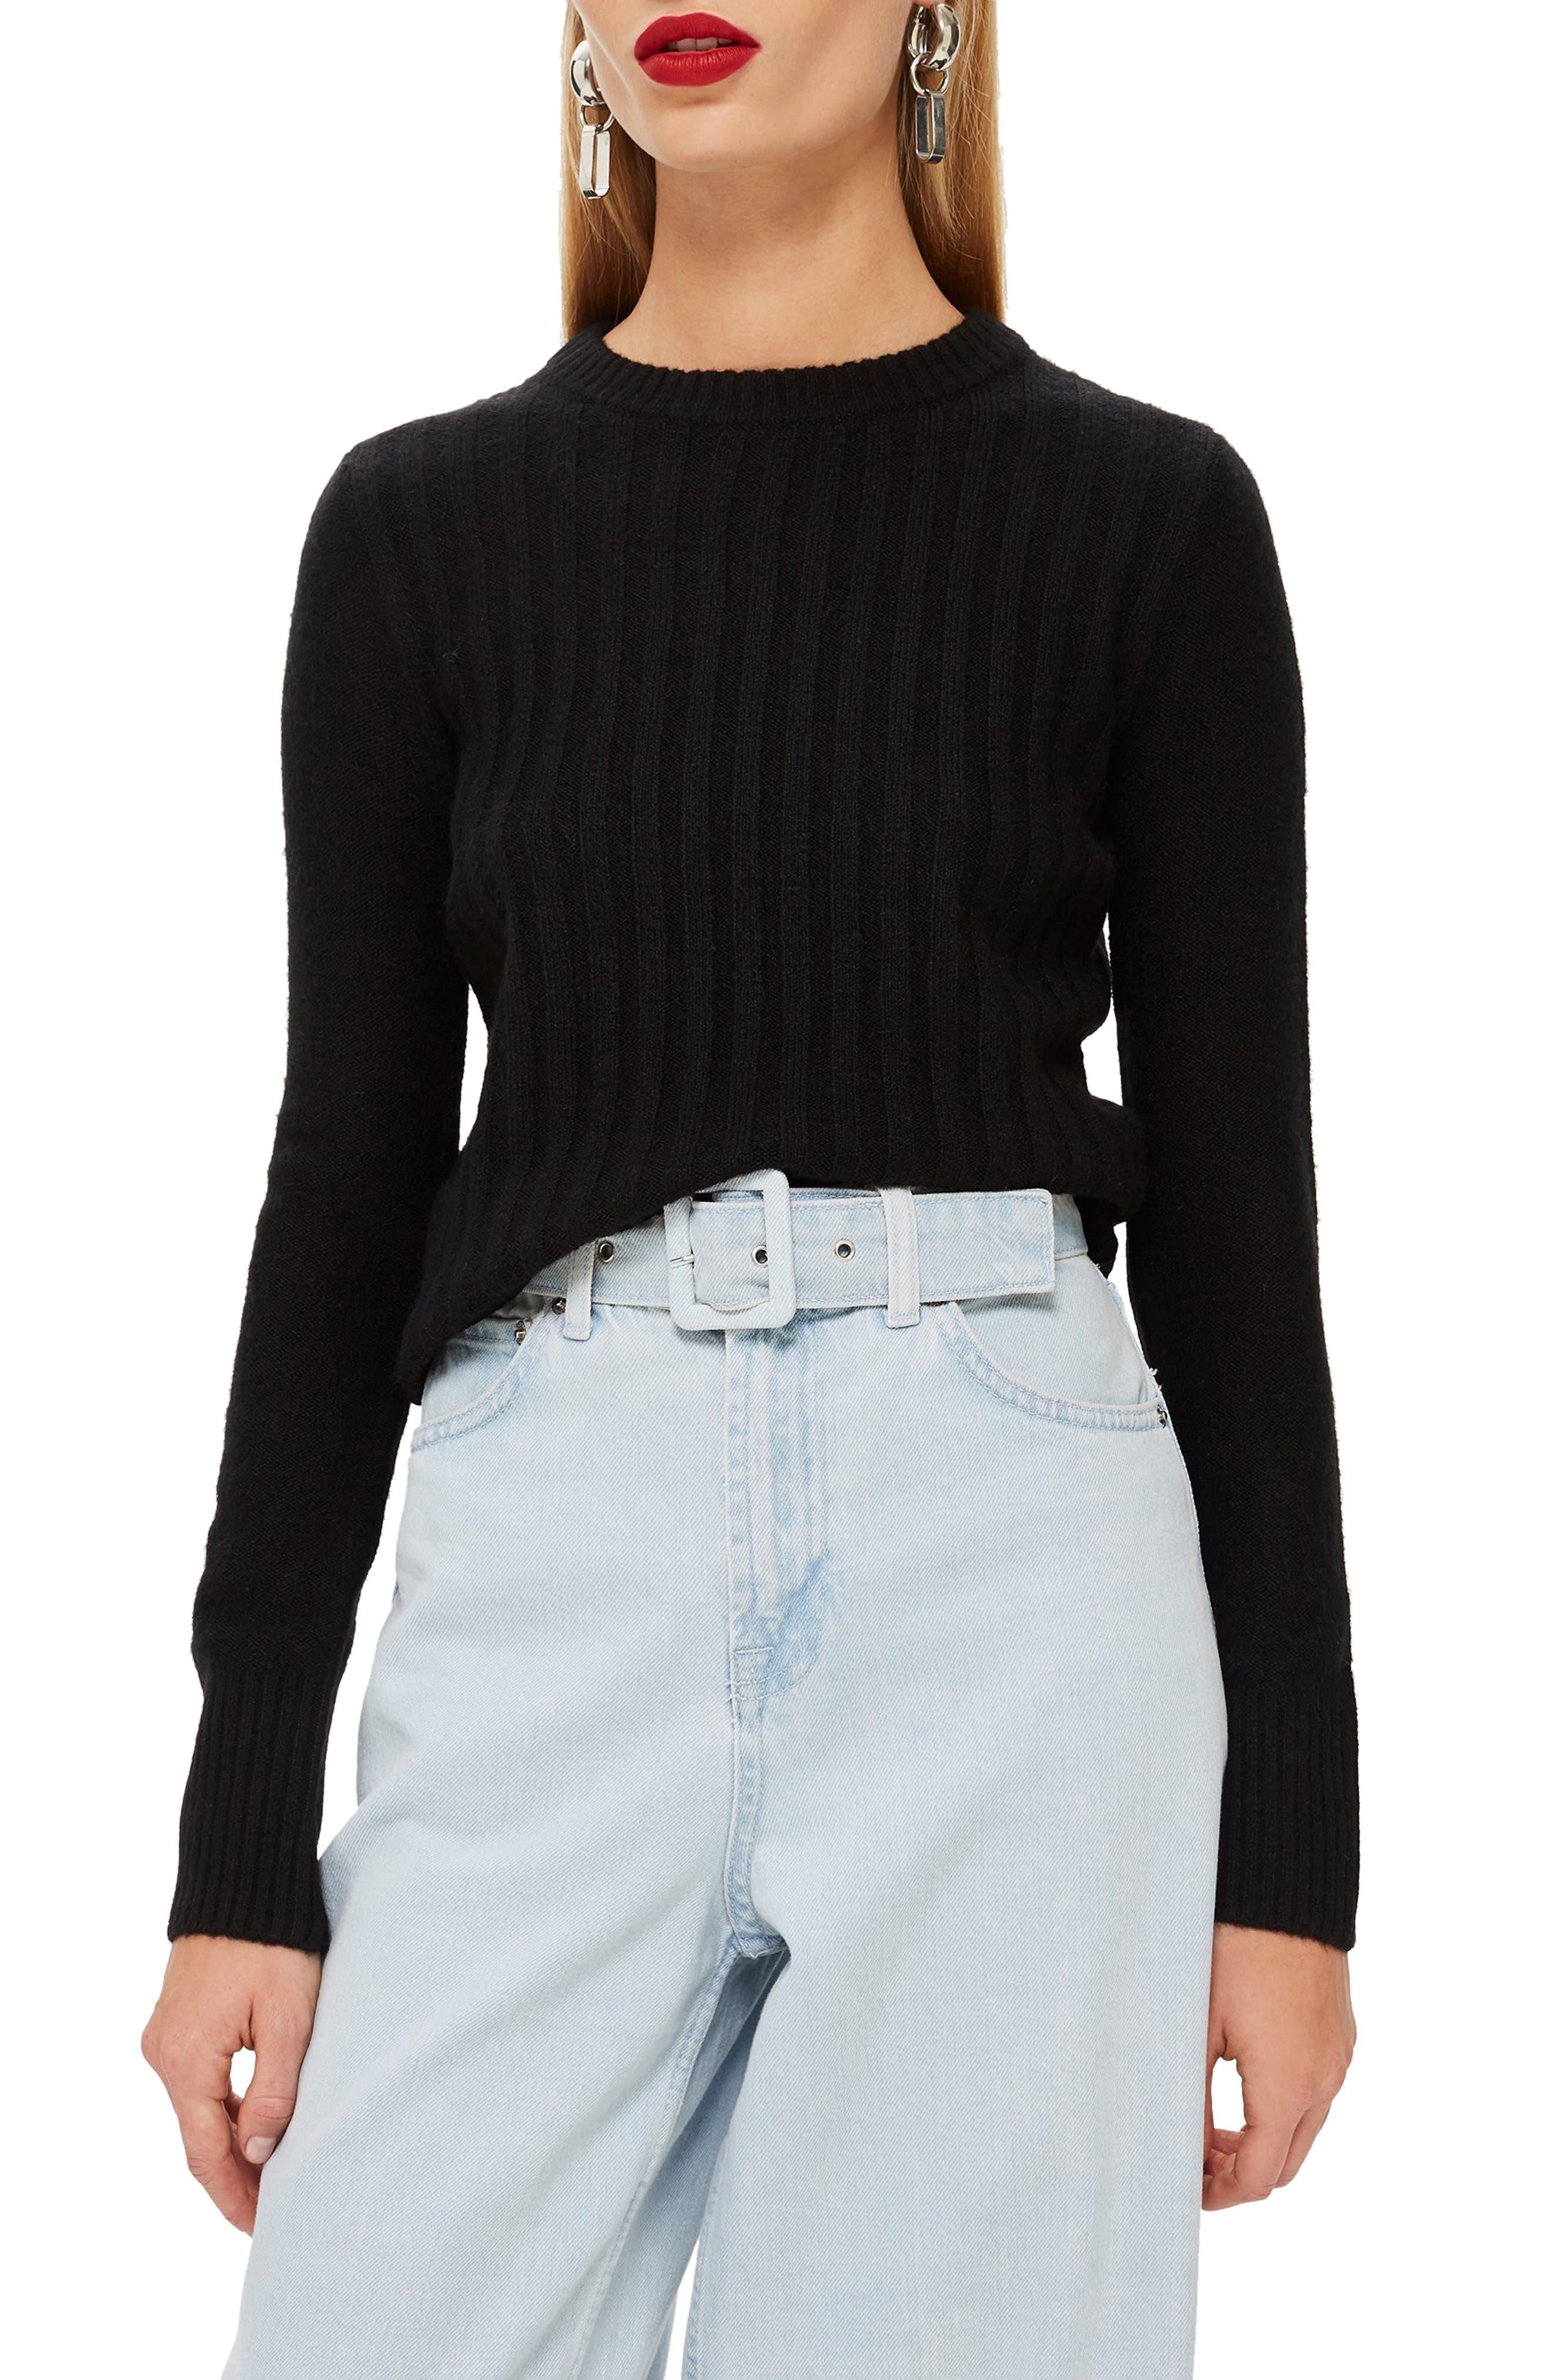 TOPSHOP, Rib Sweater, Main thumbnail 1, color, BLACK